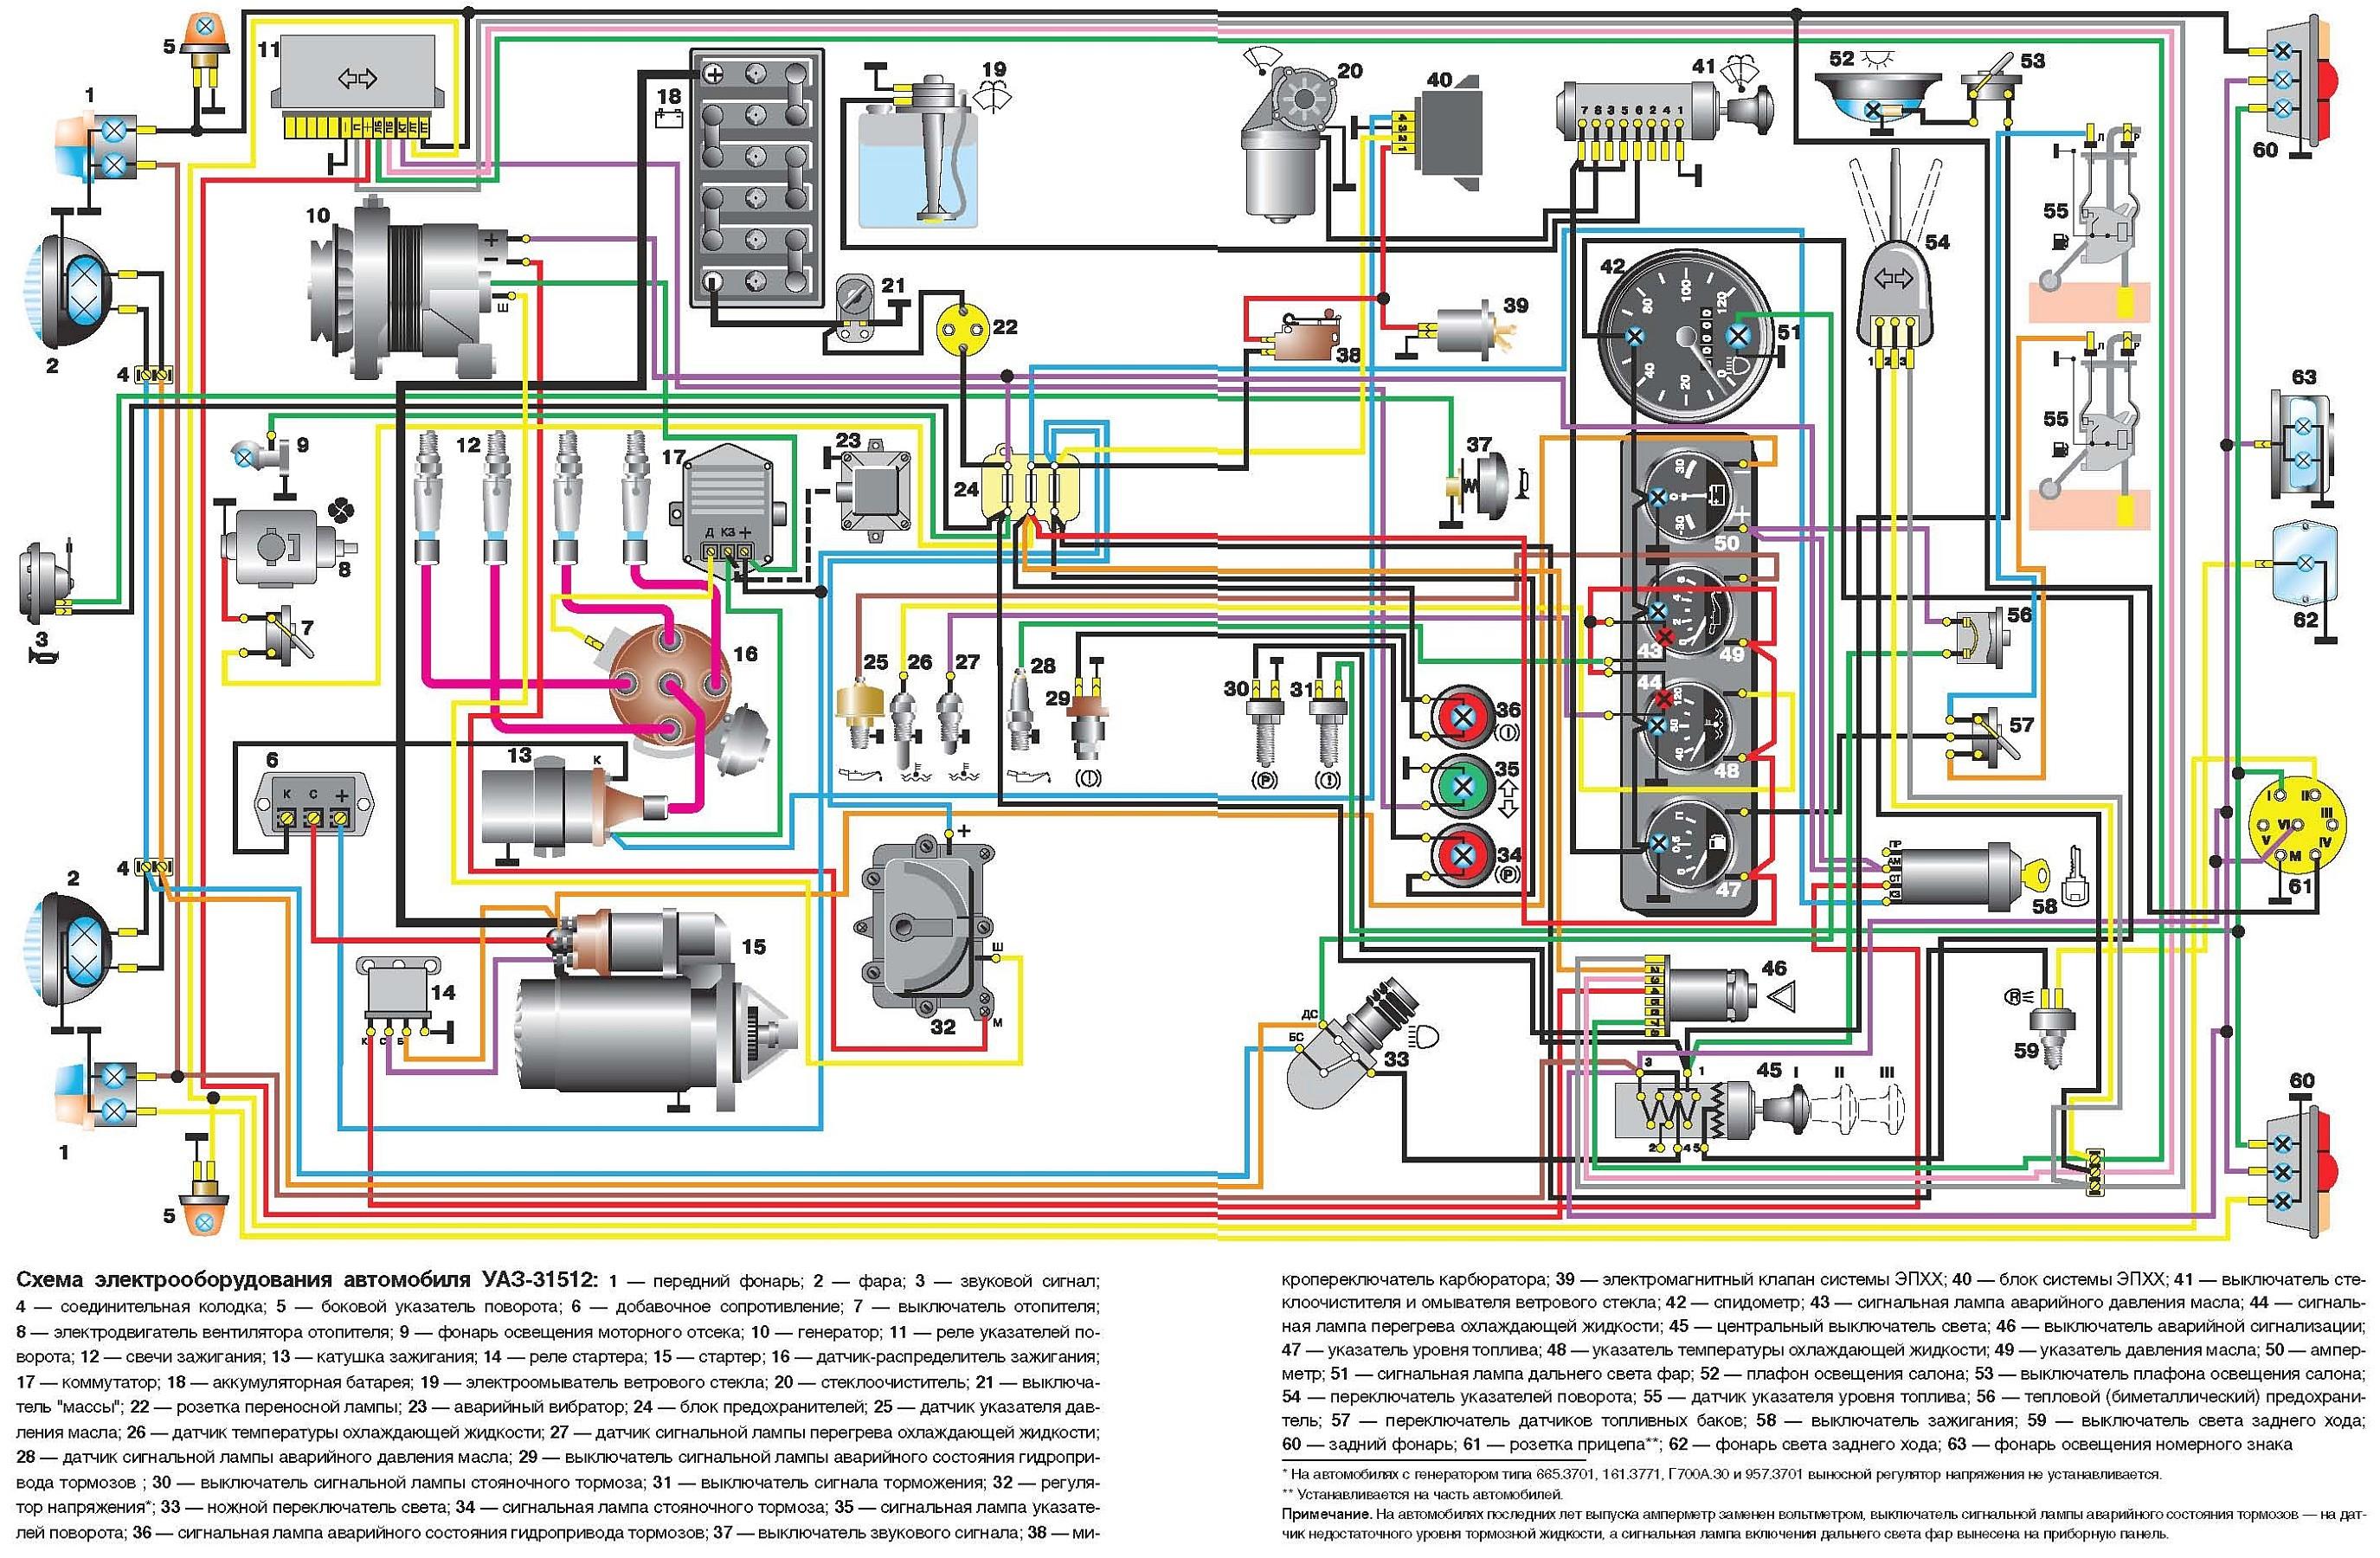 Схема проводки на уаз 31512 фото 699